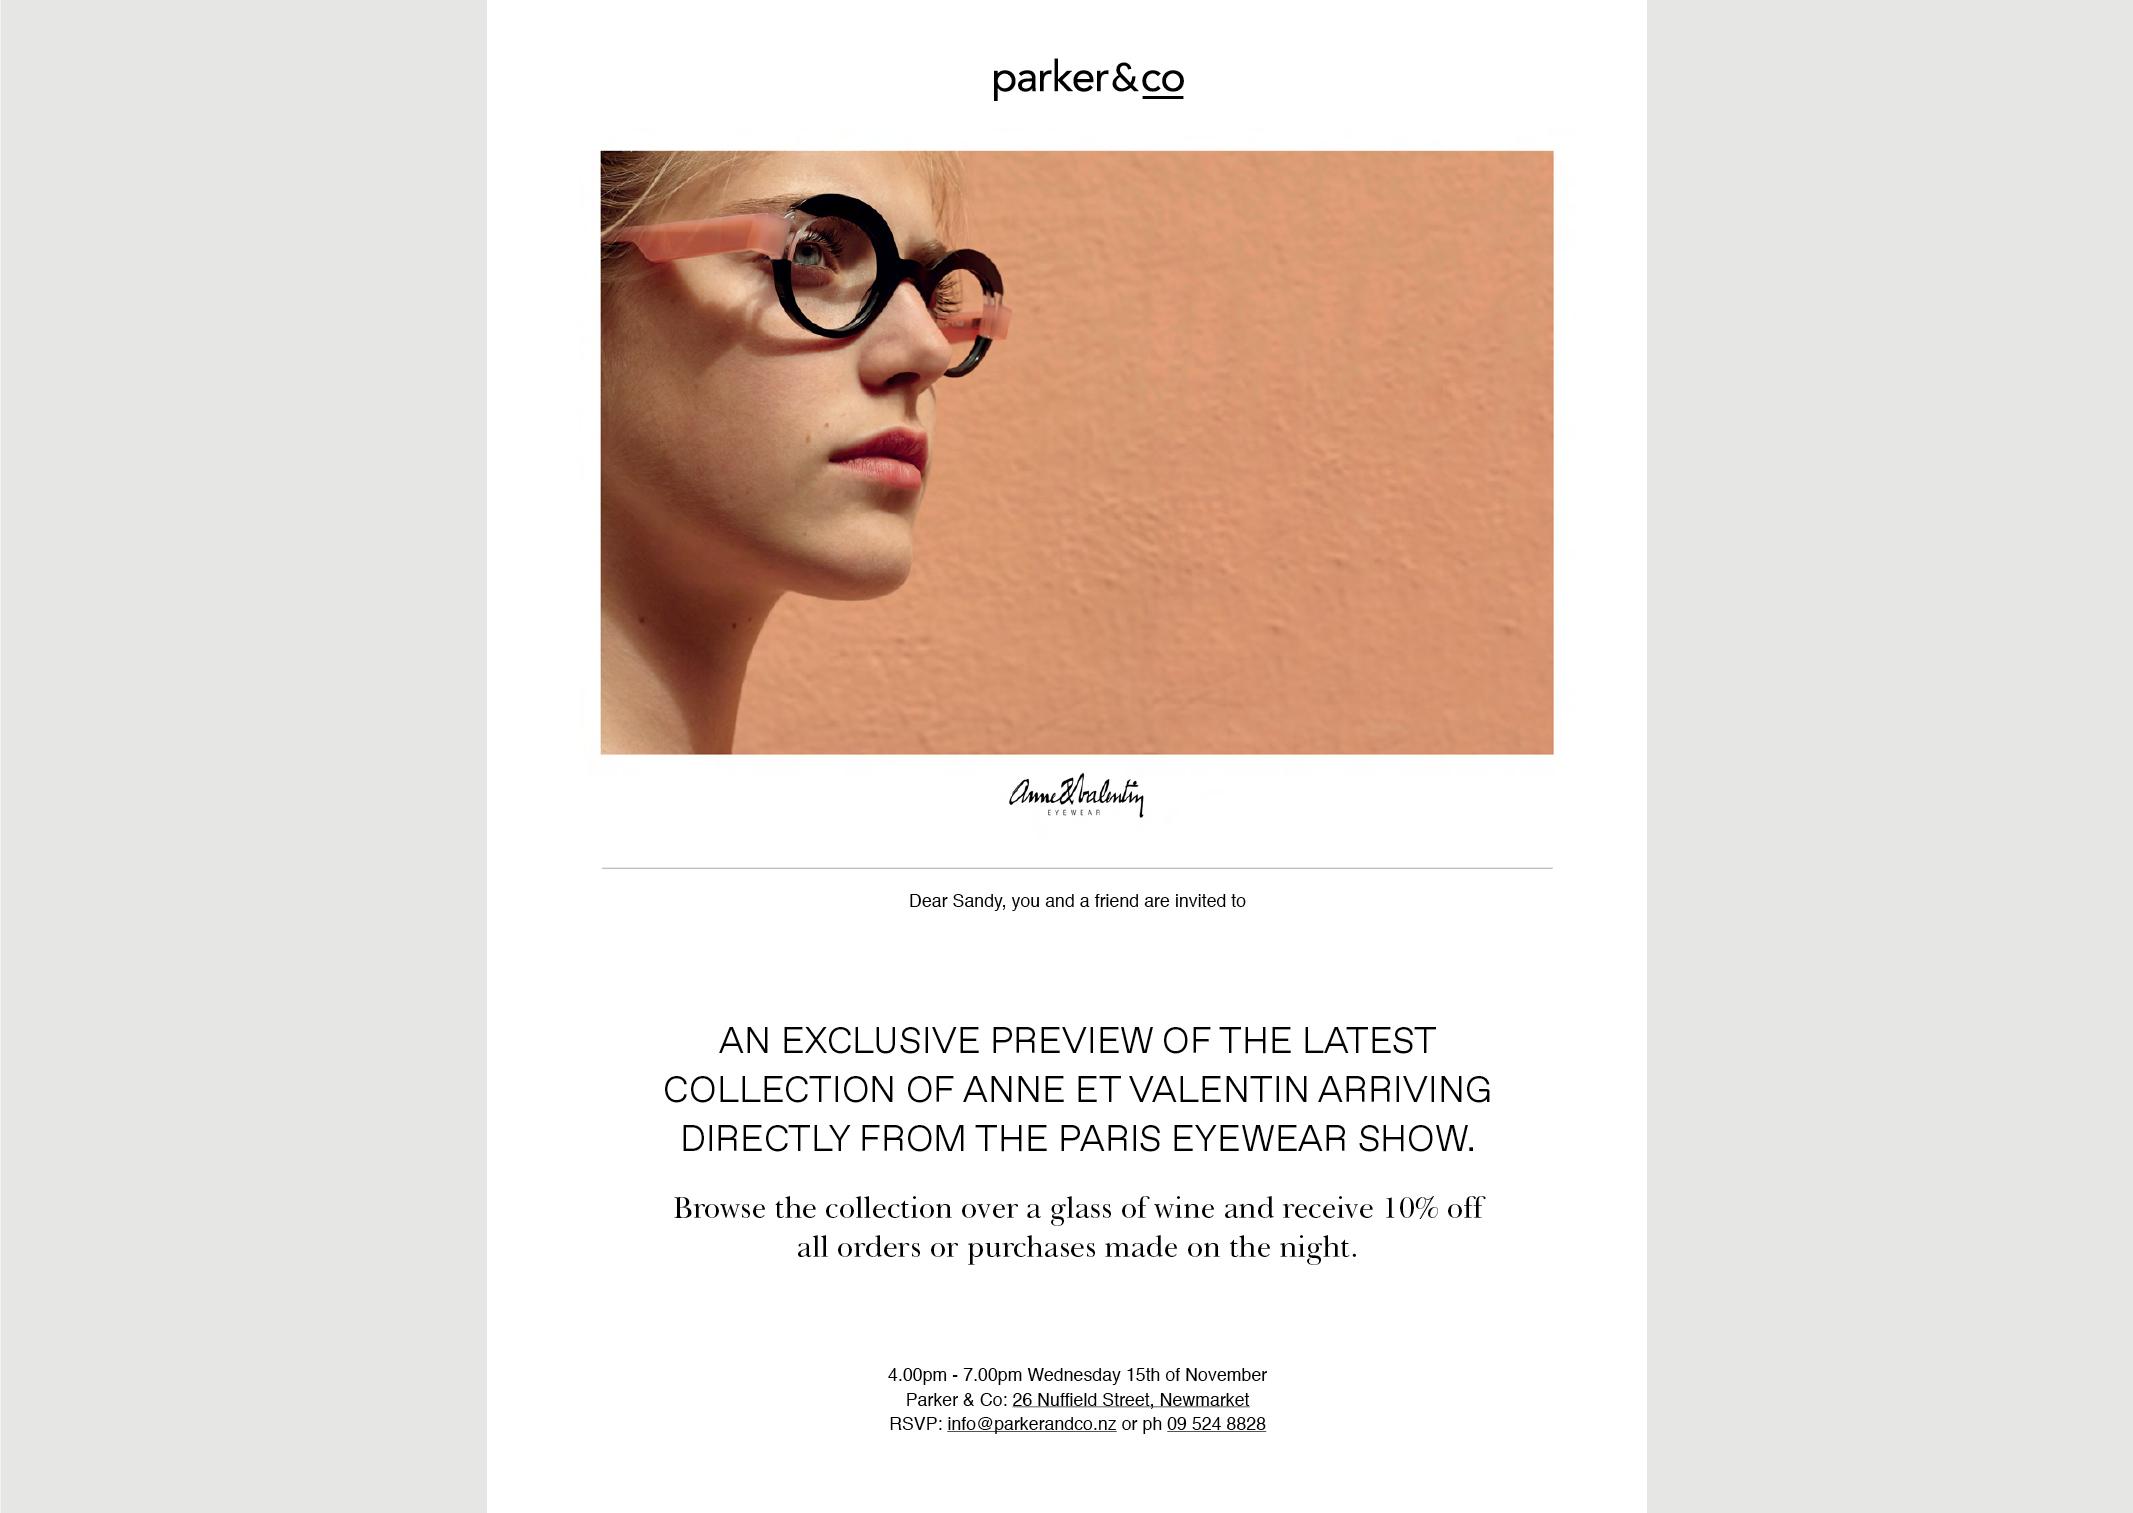 Parker & Co EDM Anne et Valentin Eyewear exclusive preview – desktop view – features dramatic view of eyewear